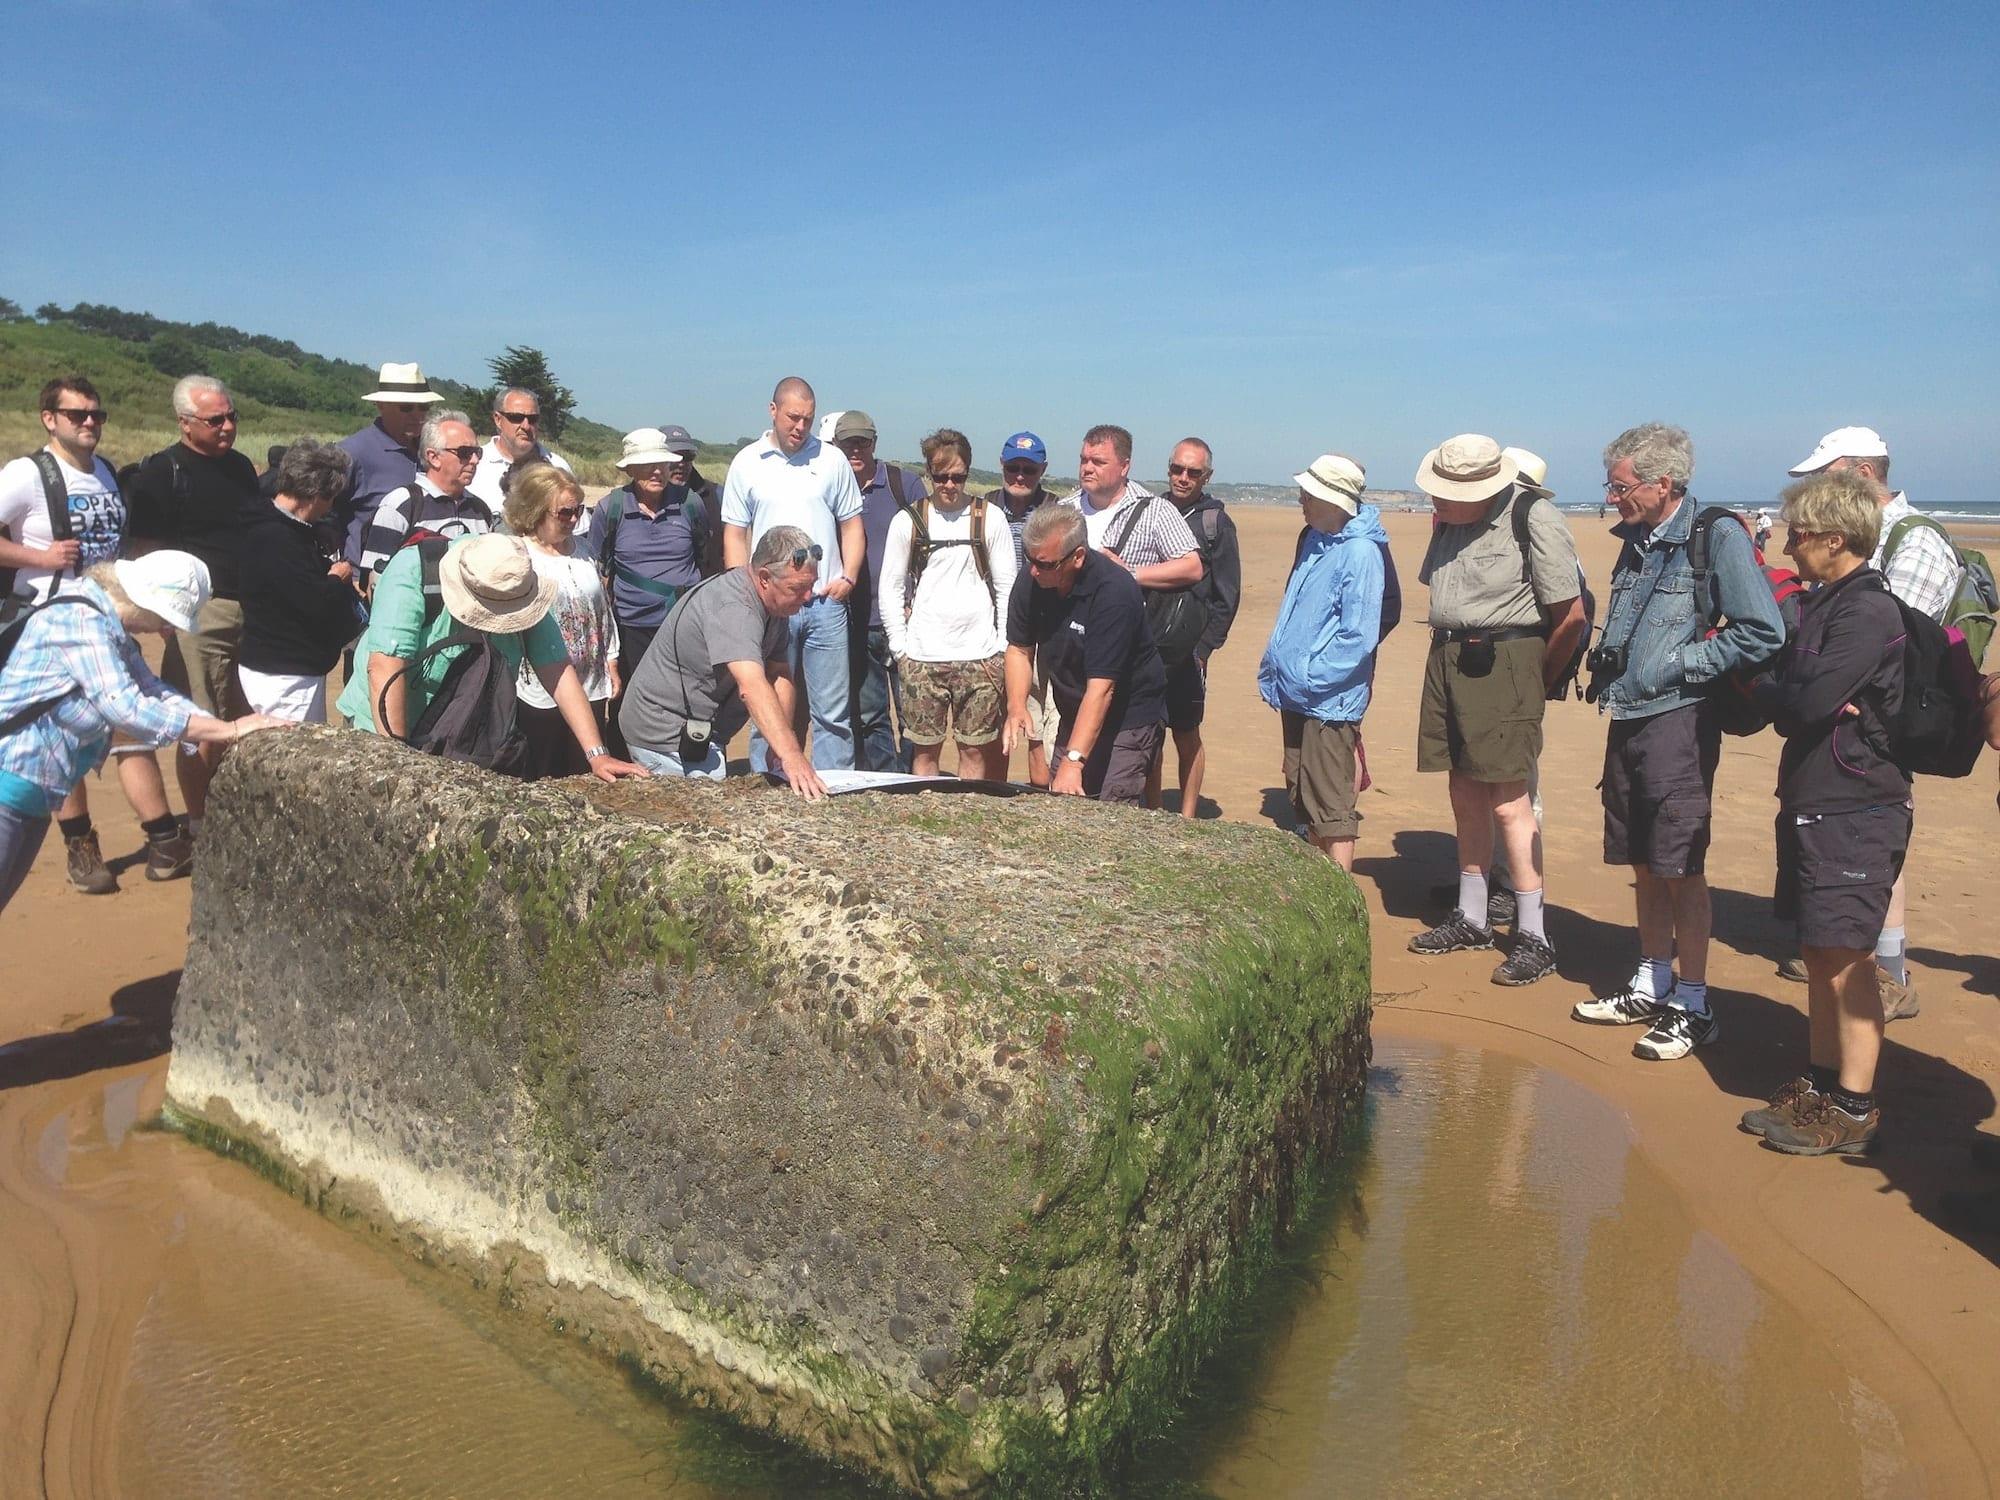 Omaha Beach - Walking the D-Day Beaches